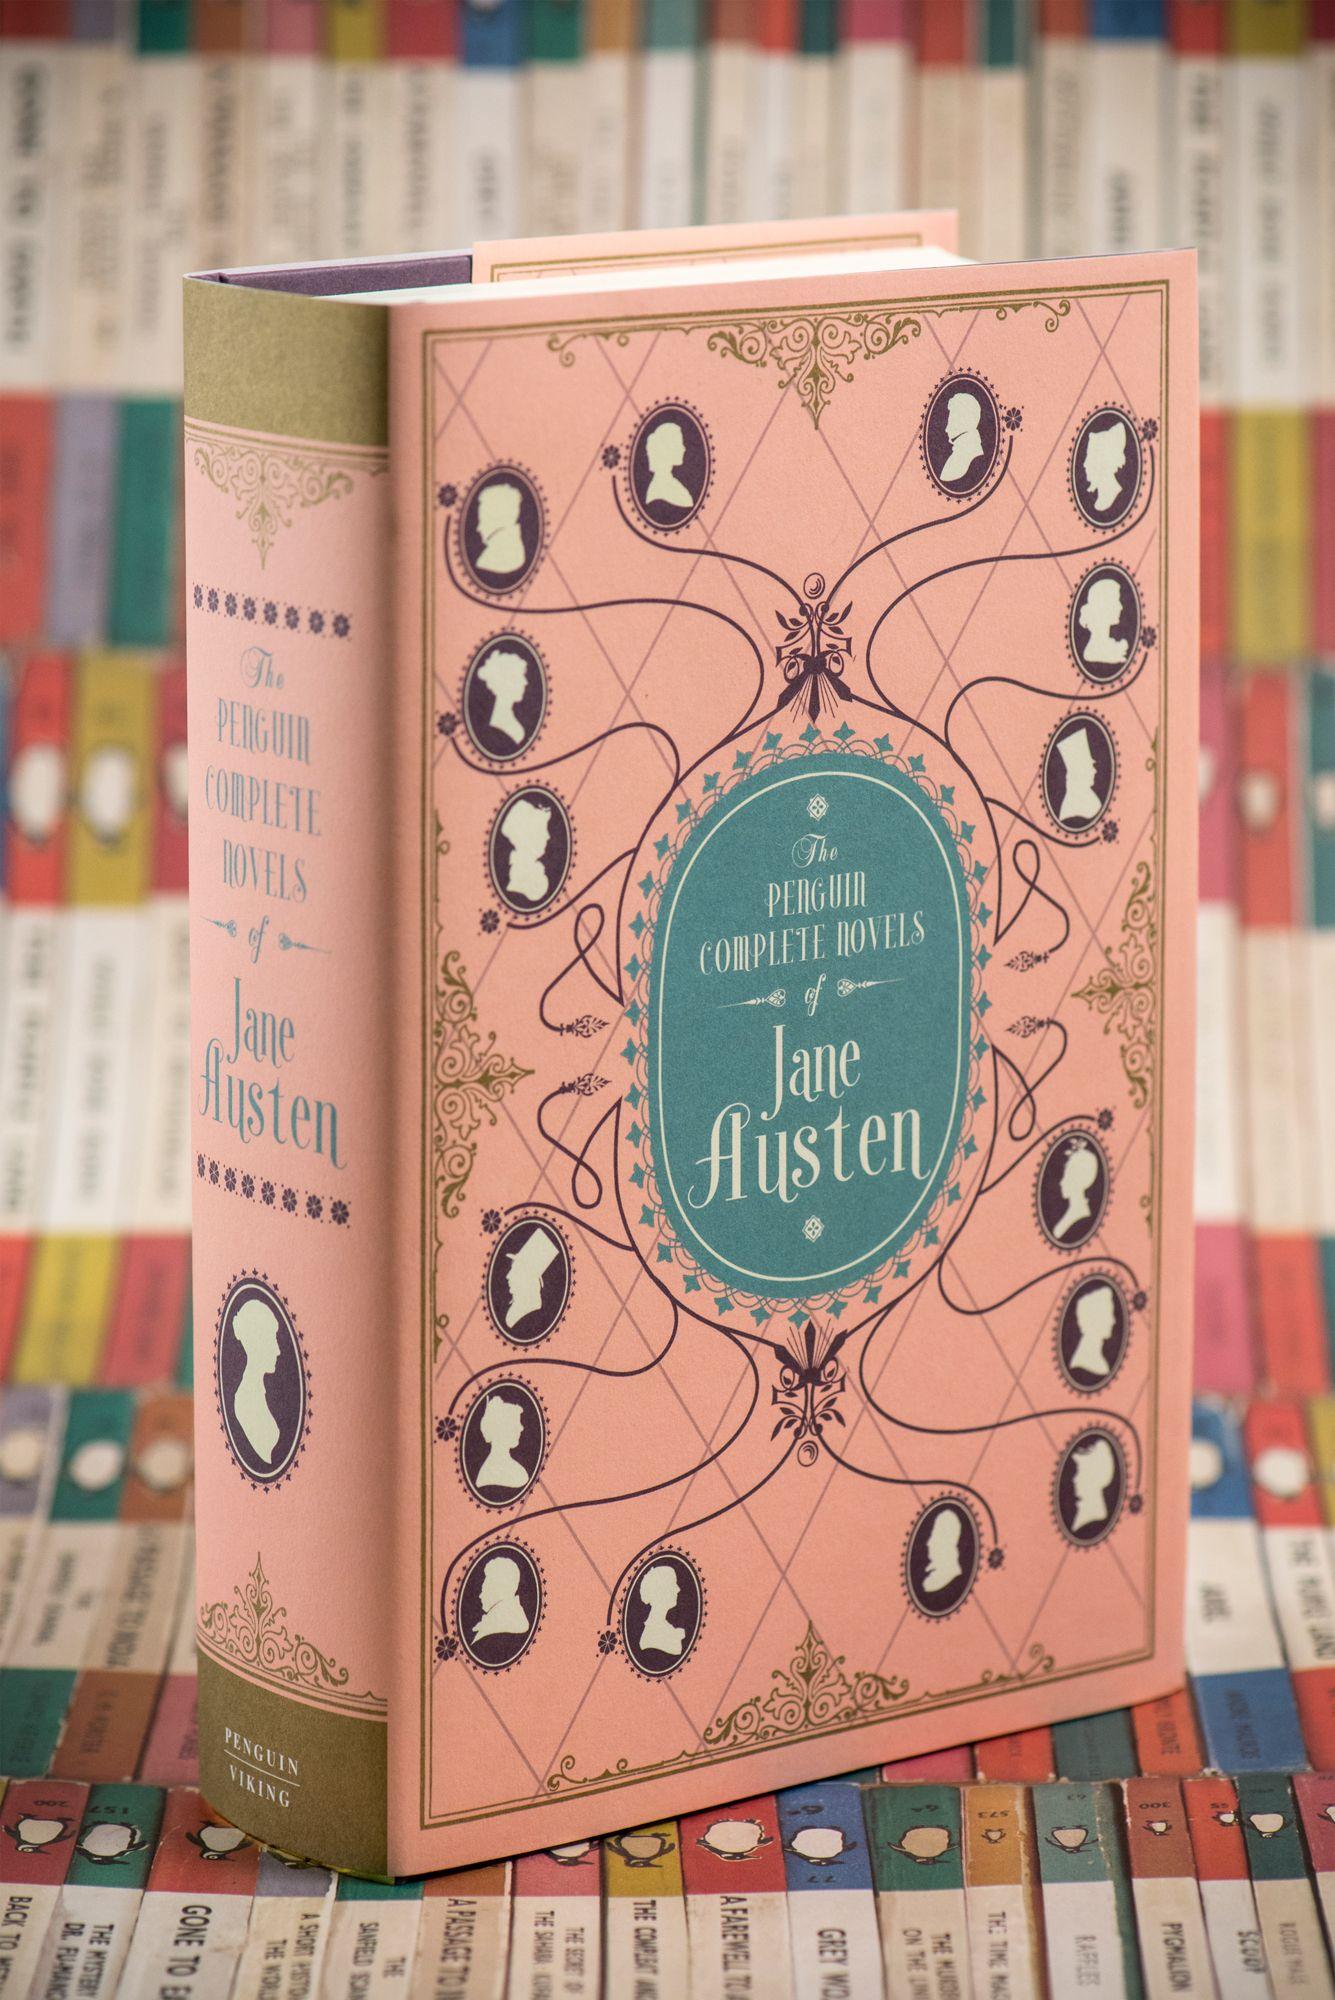 The Complete Penguin Jane Austen Few Novelists Have Conveyed The Subtleties And Nuances Of Their Own Social M Mi Mundo De Libros Libros Y Cafe Libros Lectura